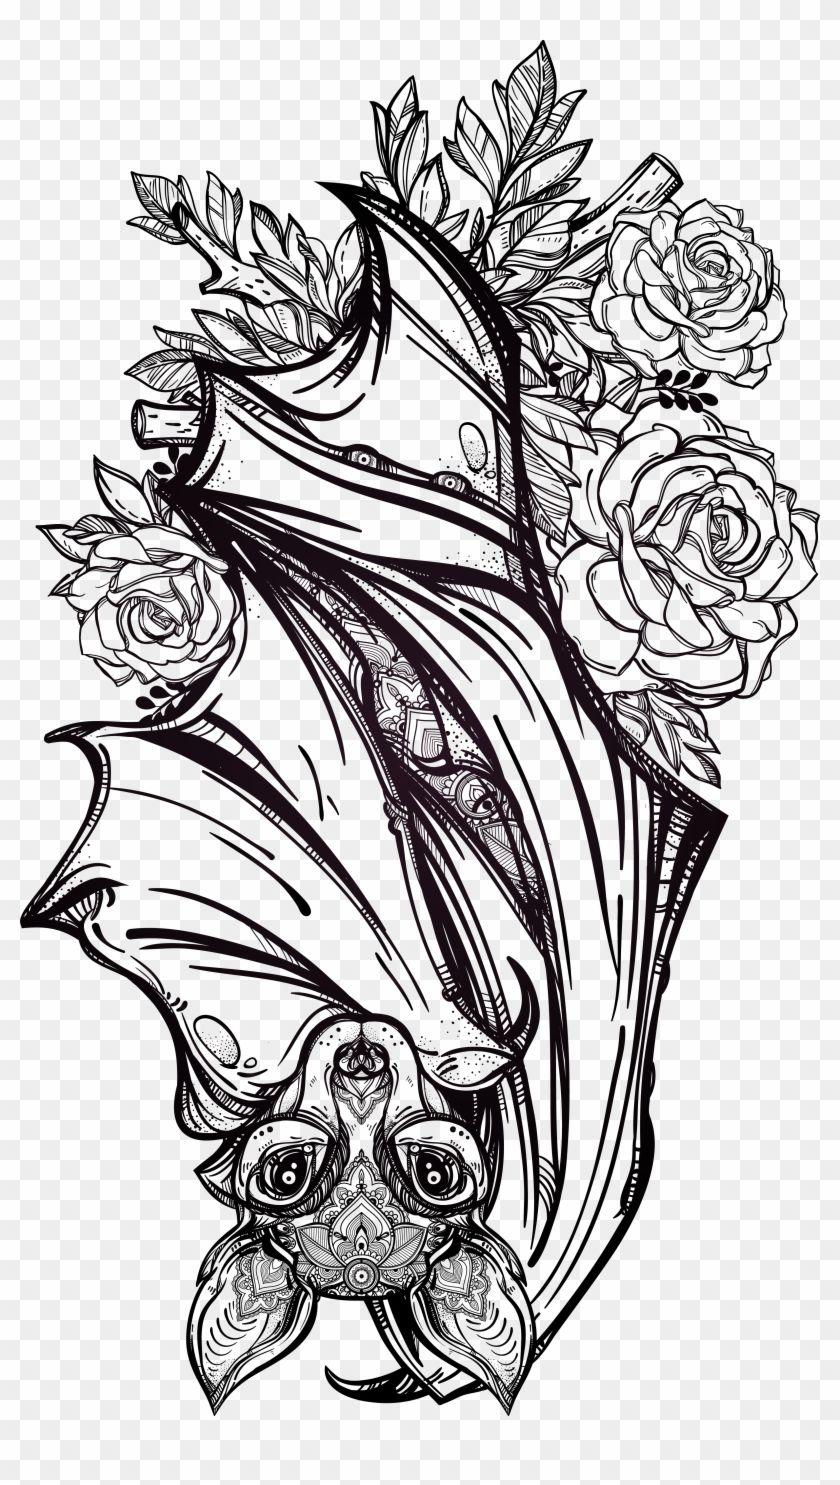 Tattoo Bat Fashion Artist Flash Gothic Bats Tattoo Design Gothic Tattoo Tattoo Design Drawings Tattoo designs hd images download